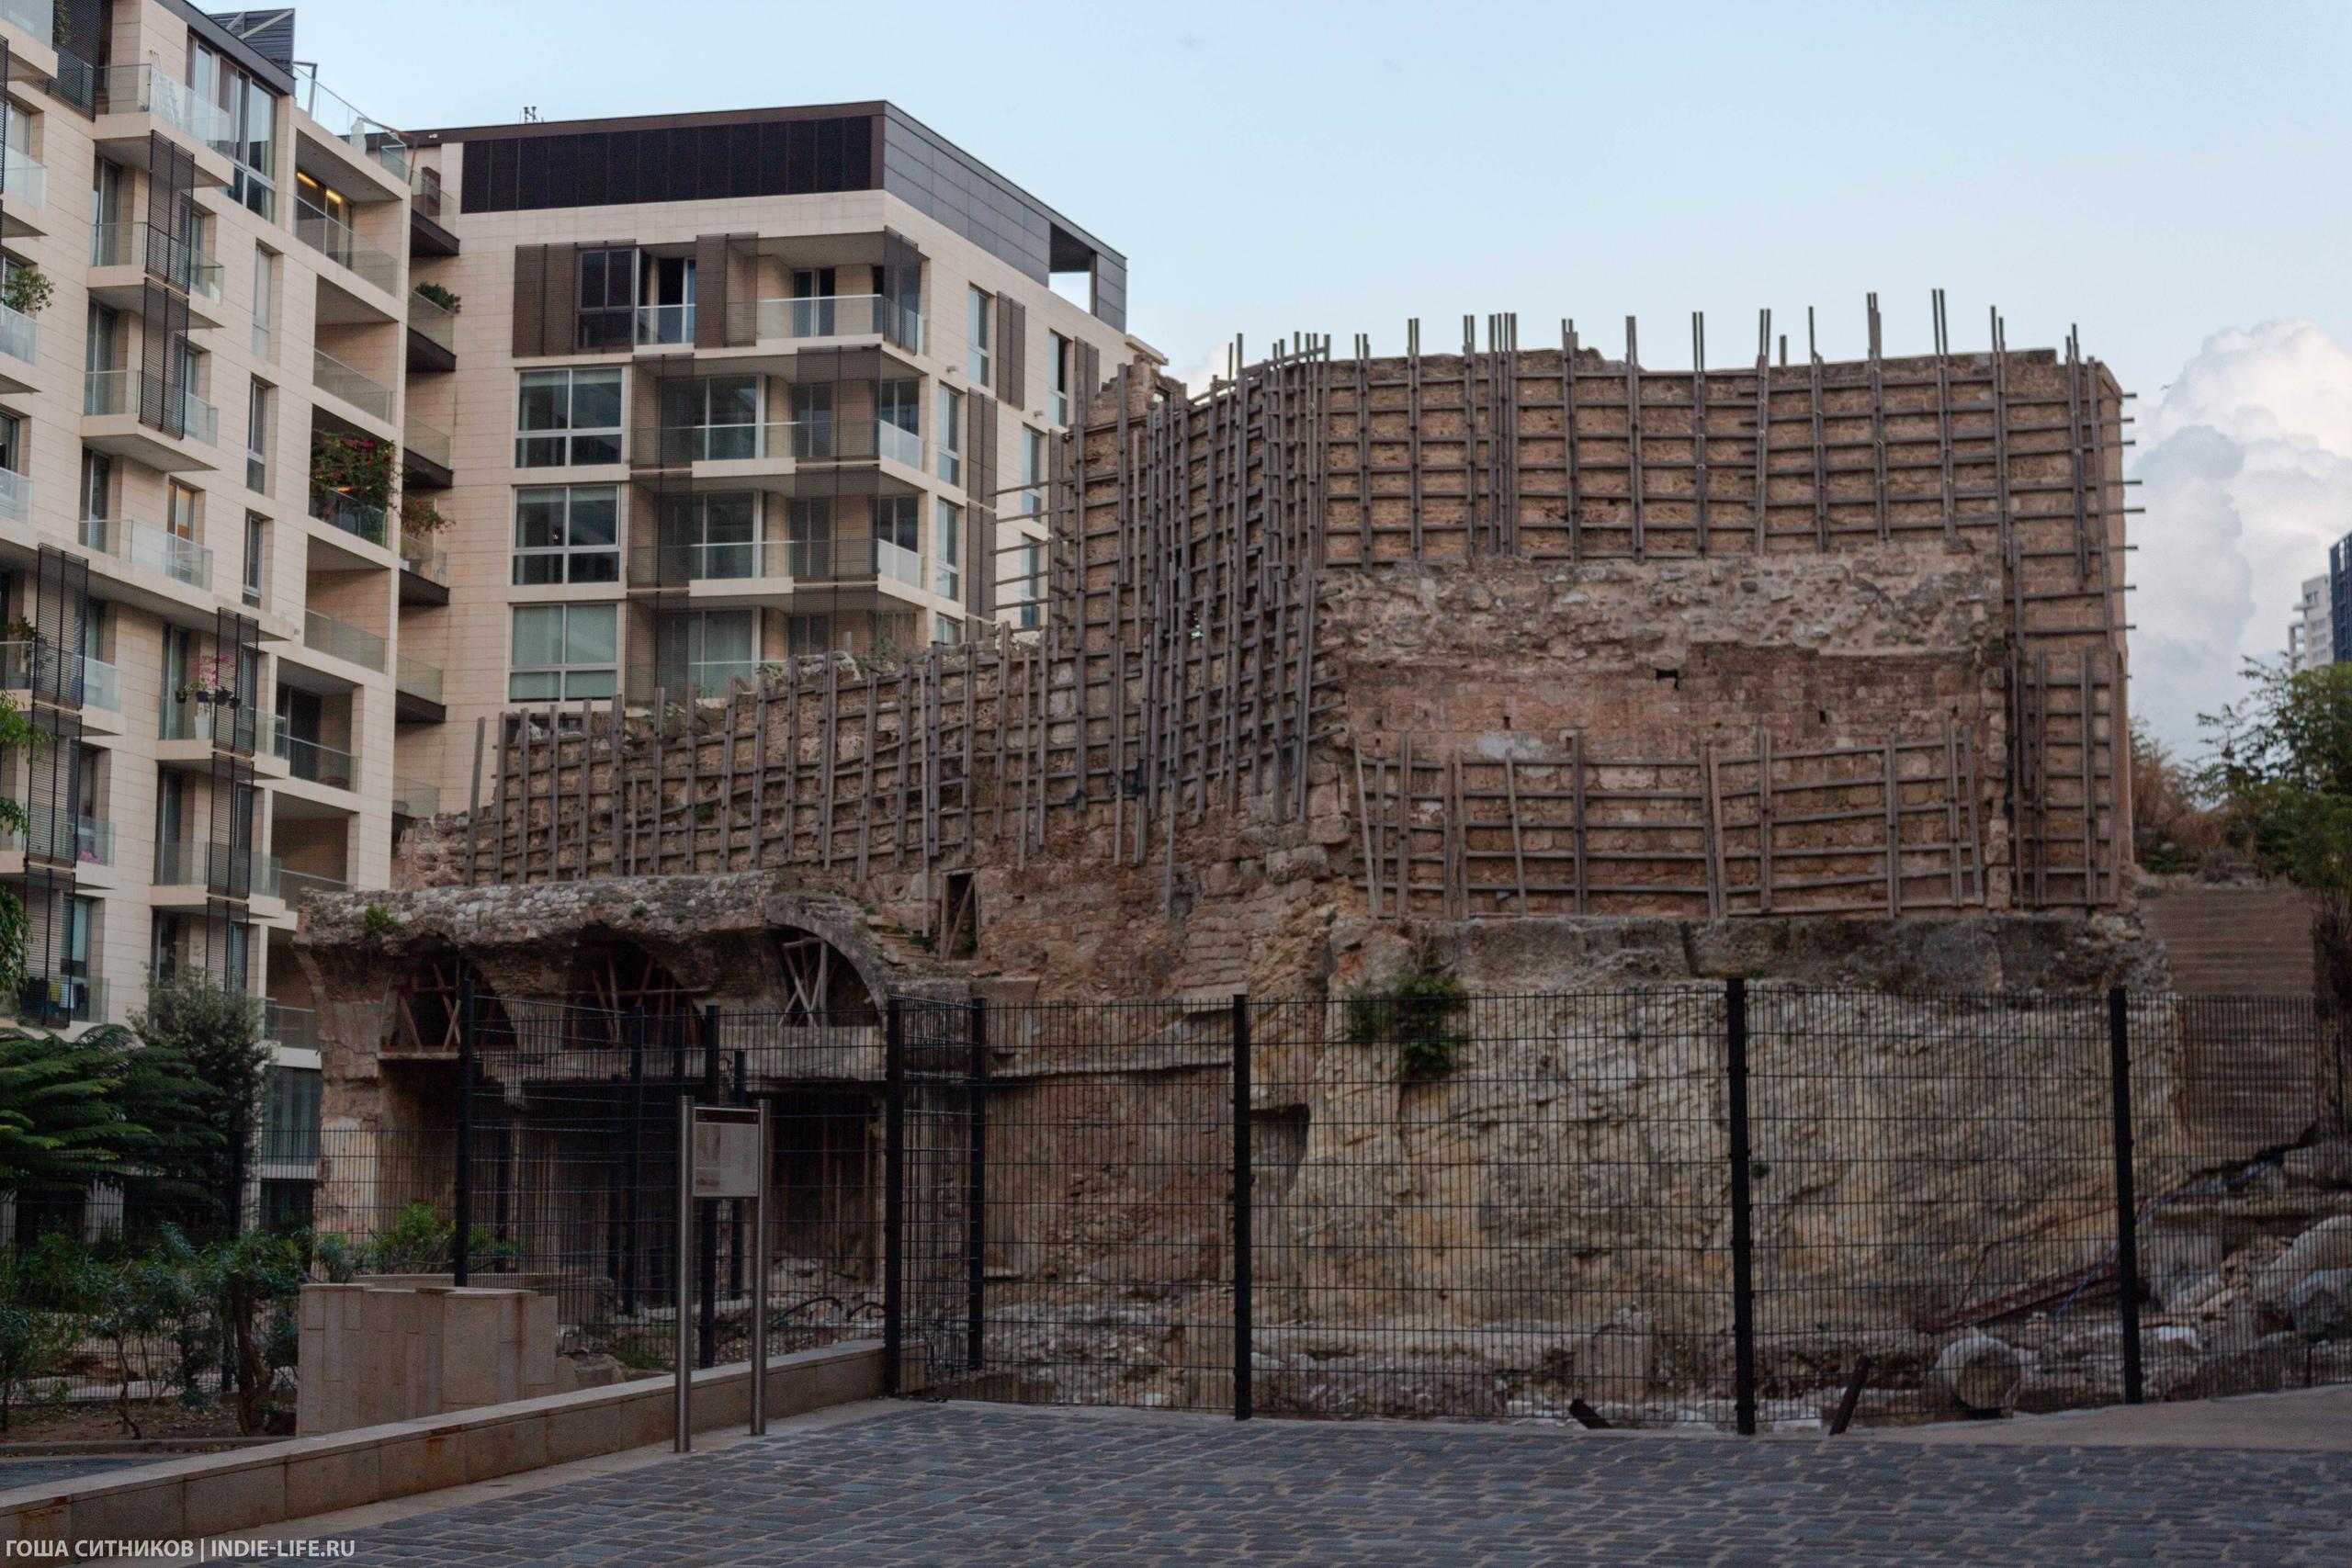 Бейрут крепость 8 века